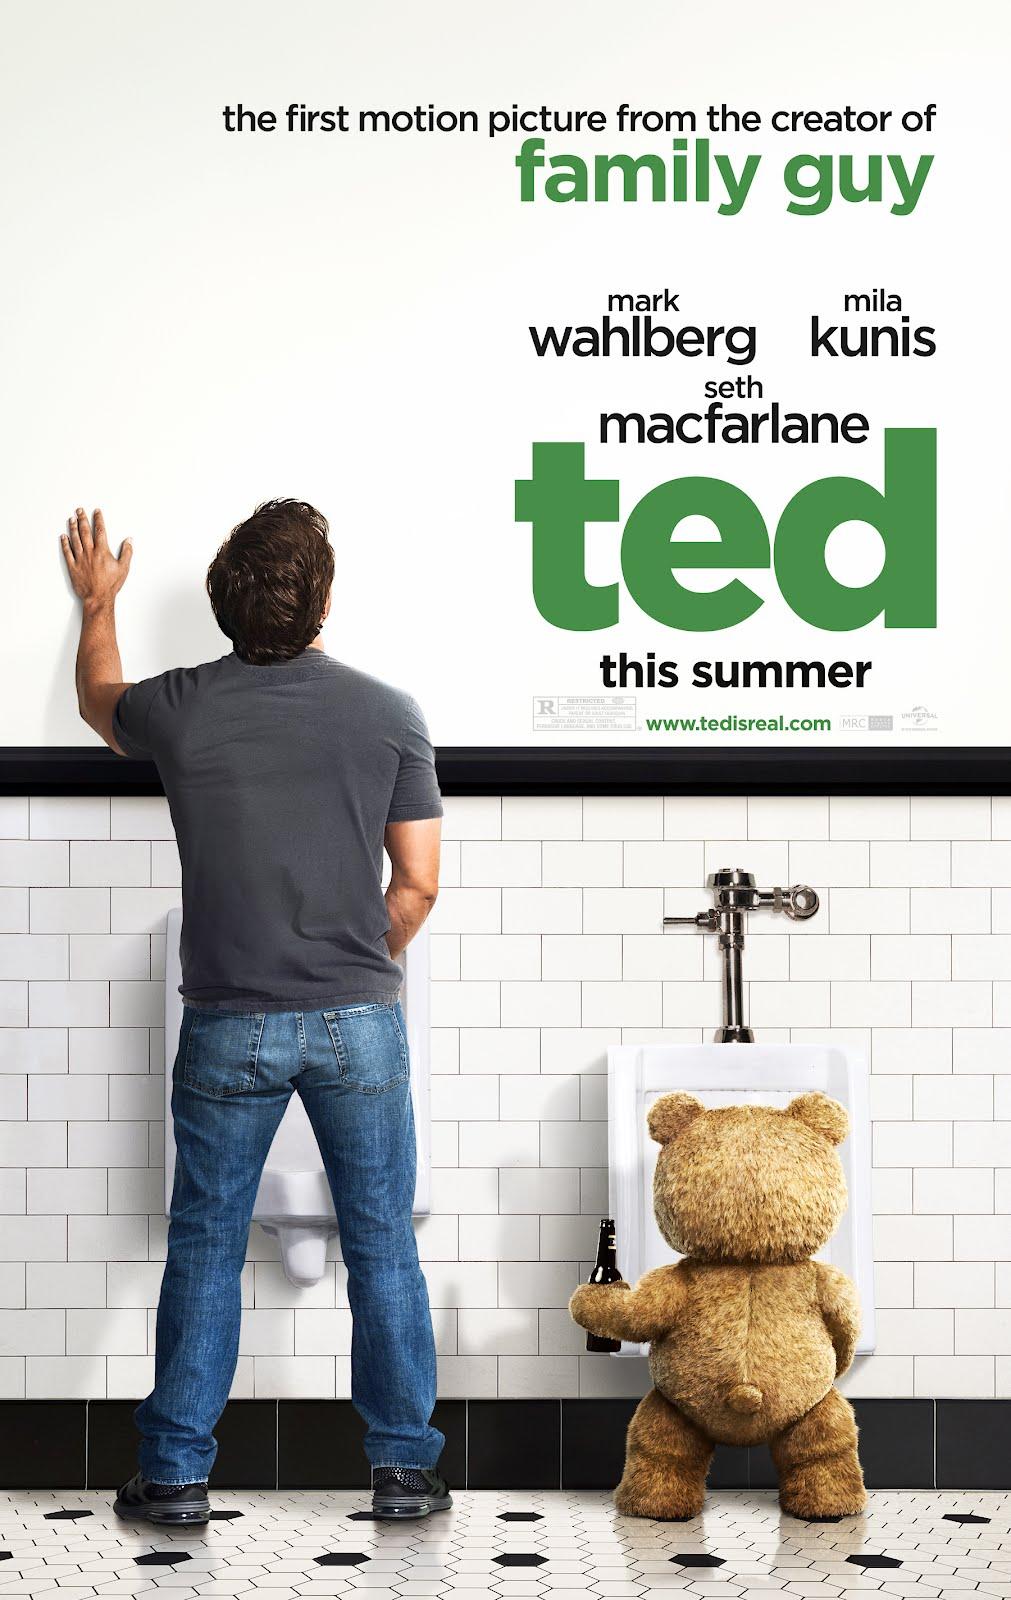 Ver Online Ver TED en Español – Película Completa online (Poster%2Bde%2BTed%2Ben%2Bpayasostrabajando.blogspot.com)